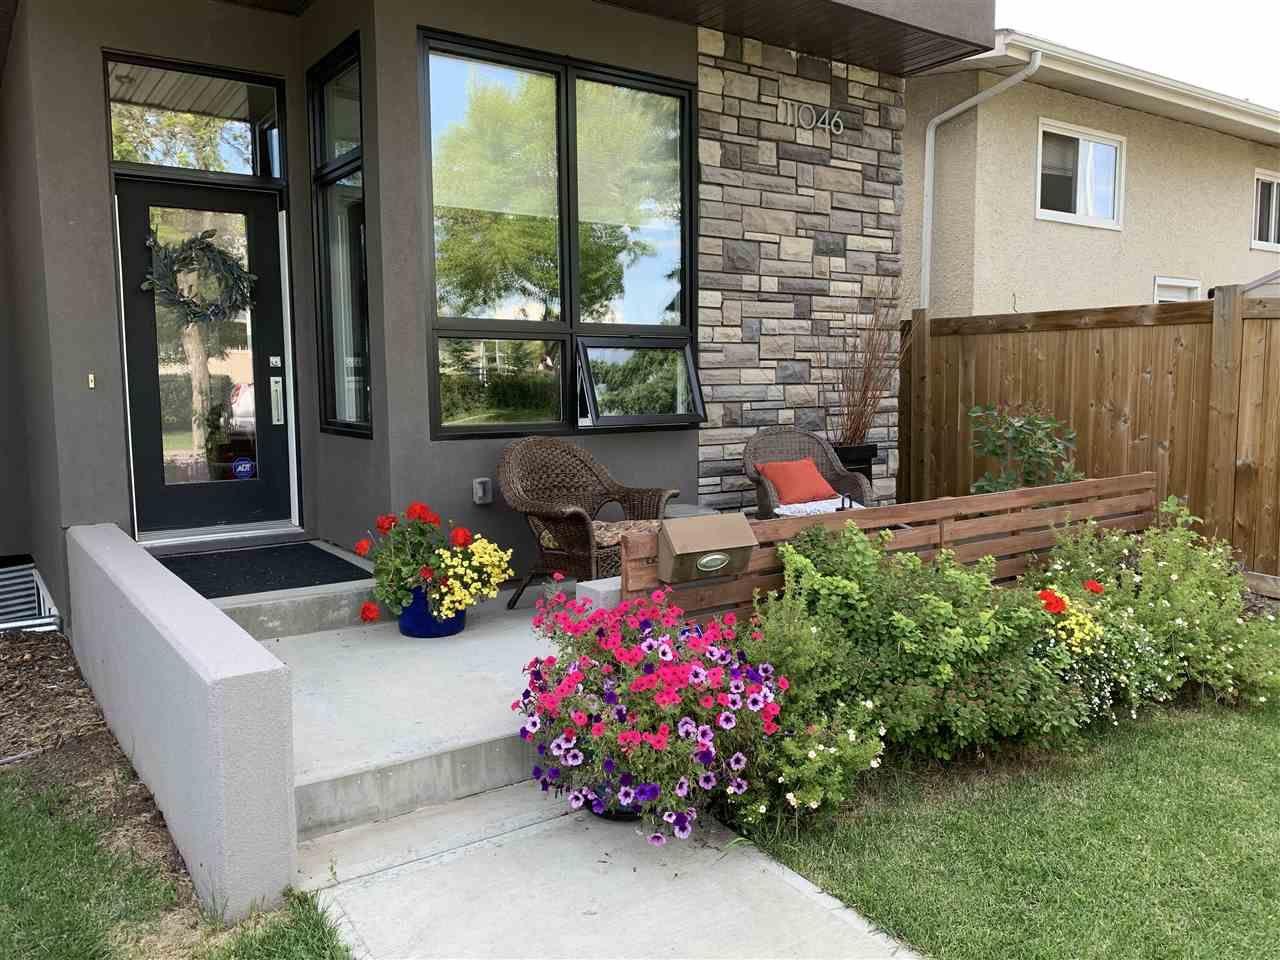 Photo 45: Photos: 11046 131 Street in Edmonton: Zone 07 House for sale : MLS®# E4235599